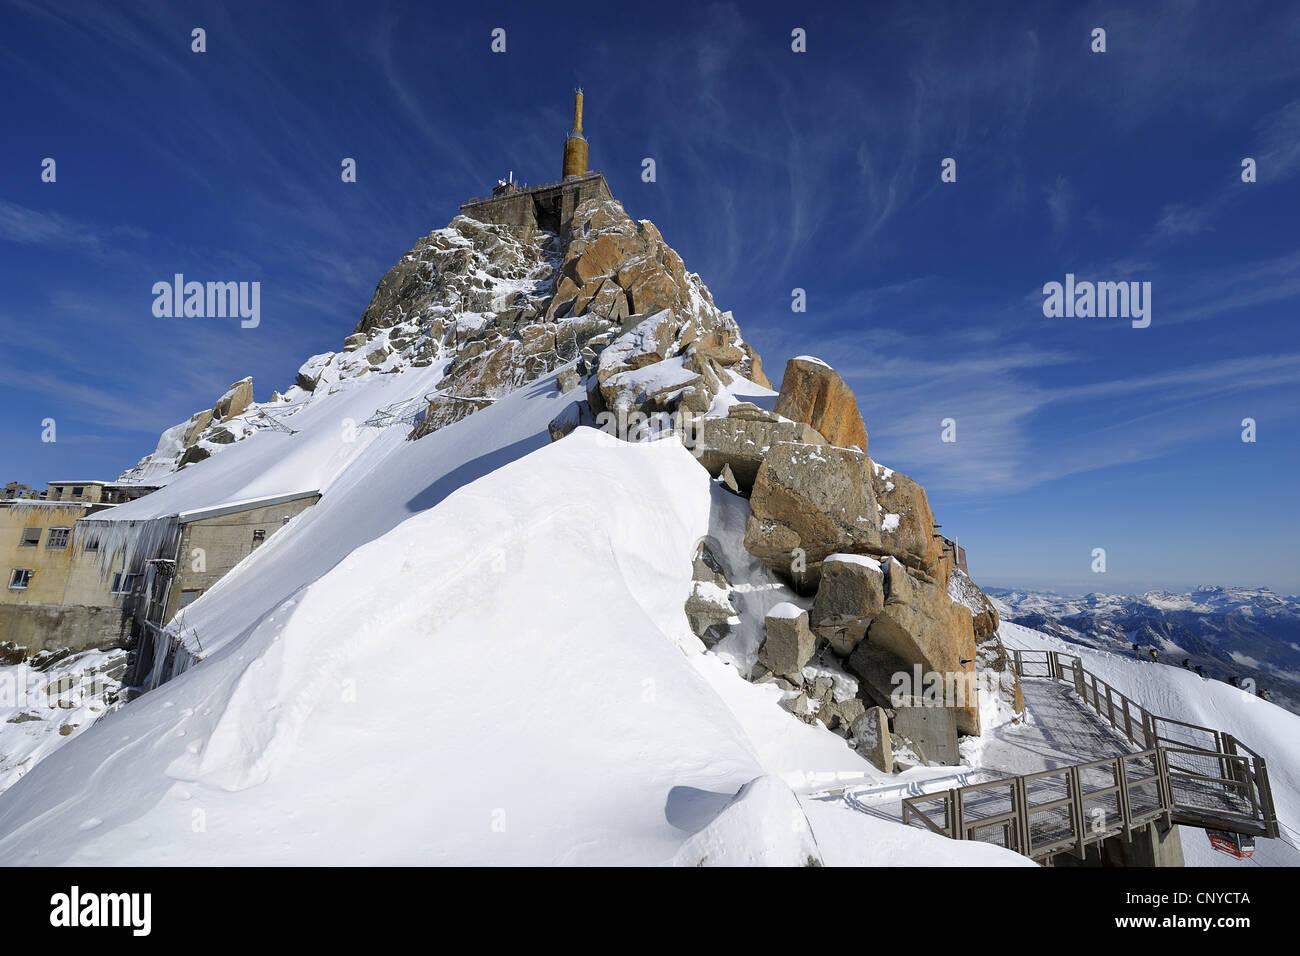 view to Aiguille du Midi, France, Mont Blanc - Stock Image